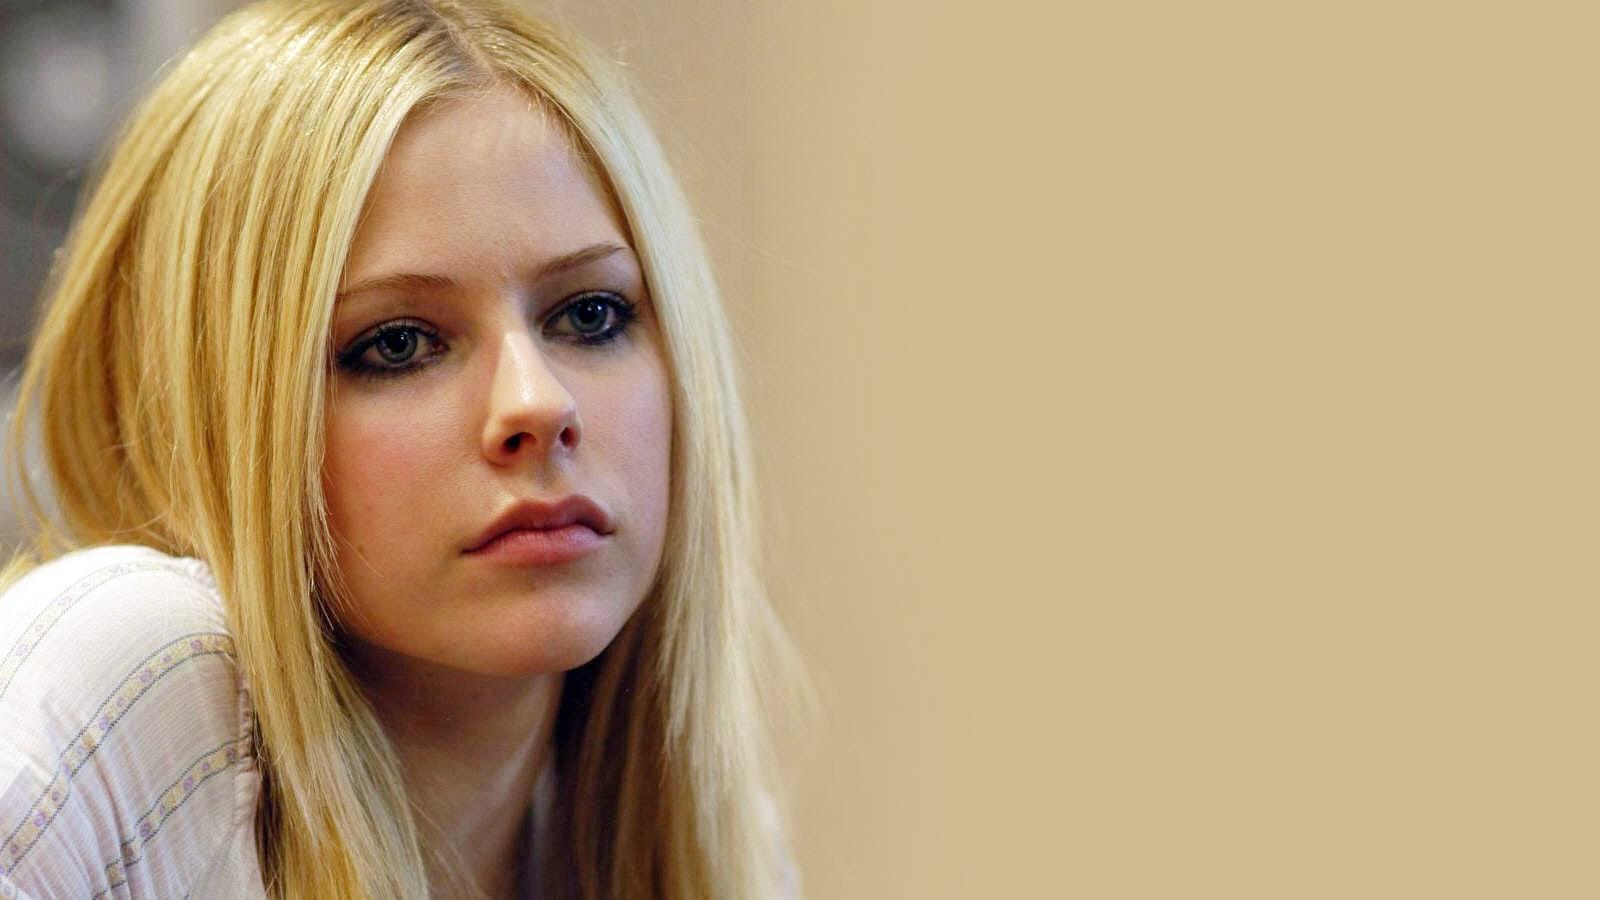 Avril Lavigne widescreen for desktop